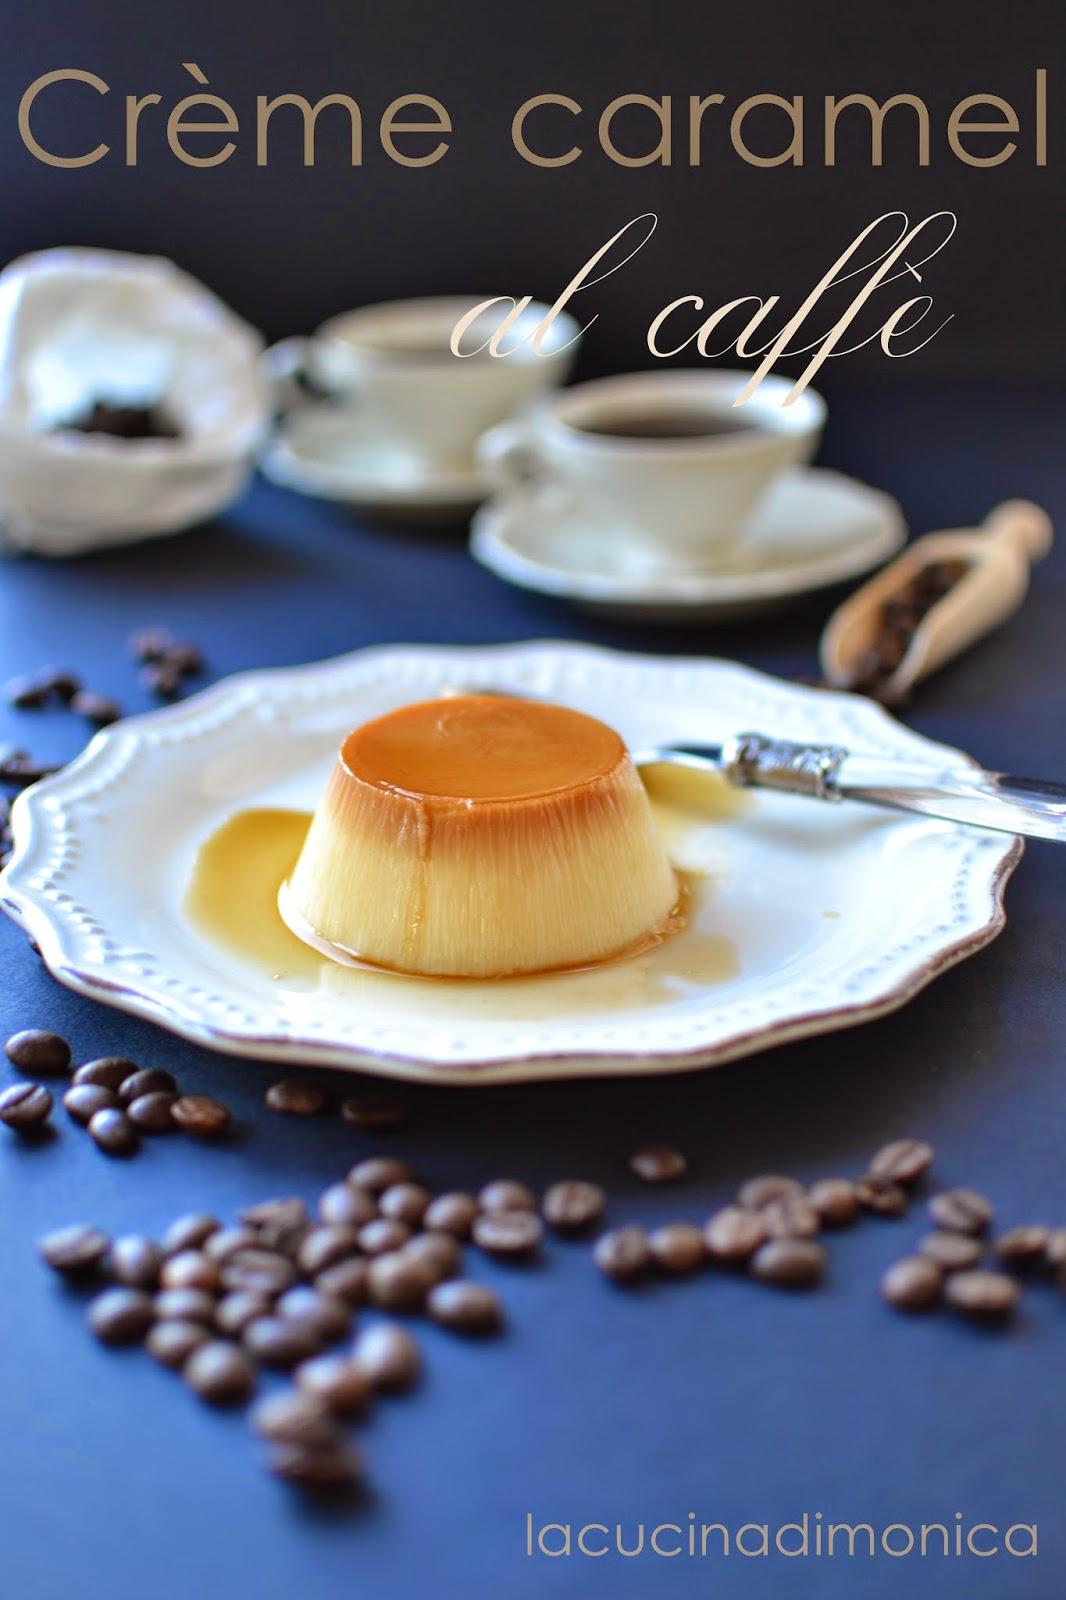 crème caramel al caffè